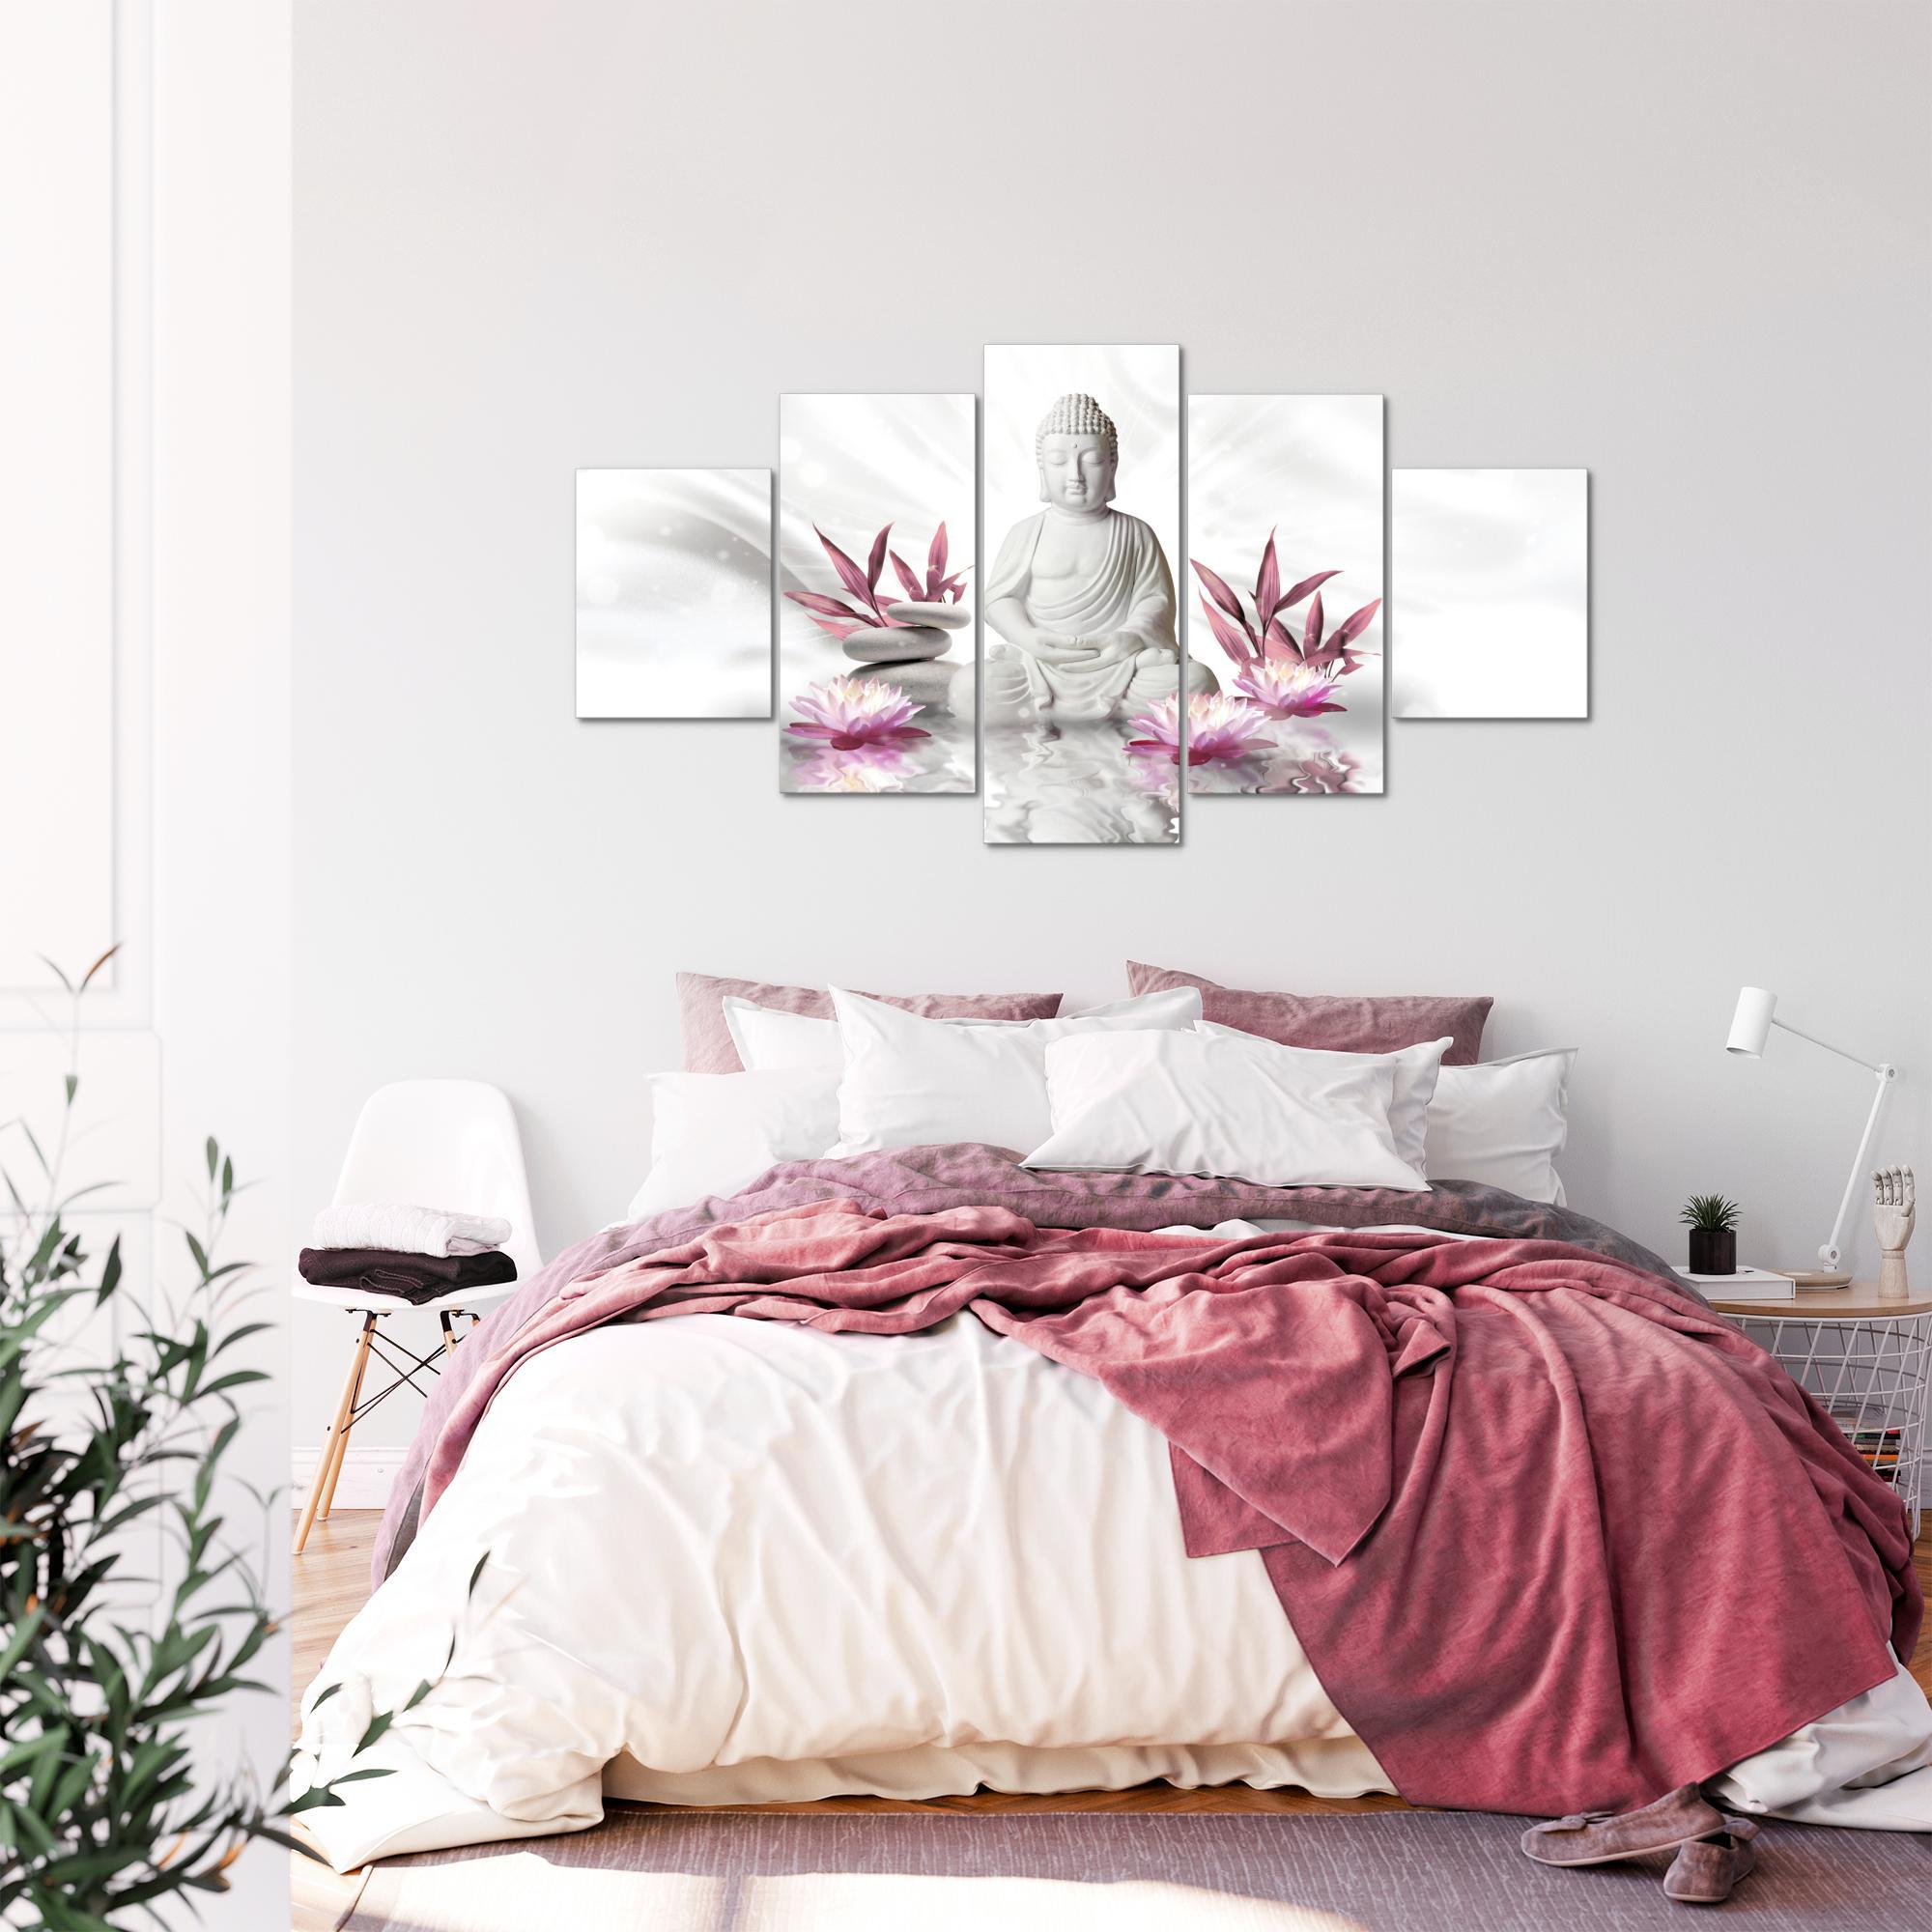 buddha feng shui bild kunstdruck auf vlies leinwand xxl dekoration 01165p. Black Bedroom Furniture Sets. Home Design Ideas